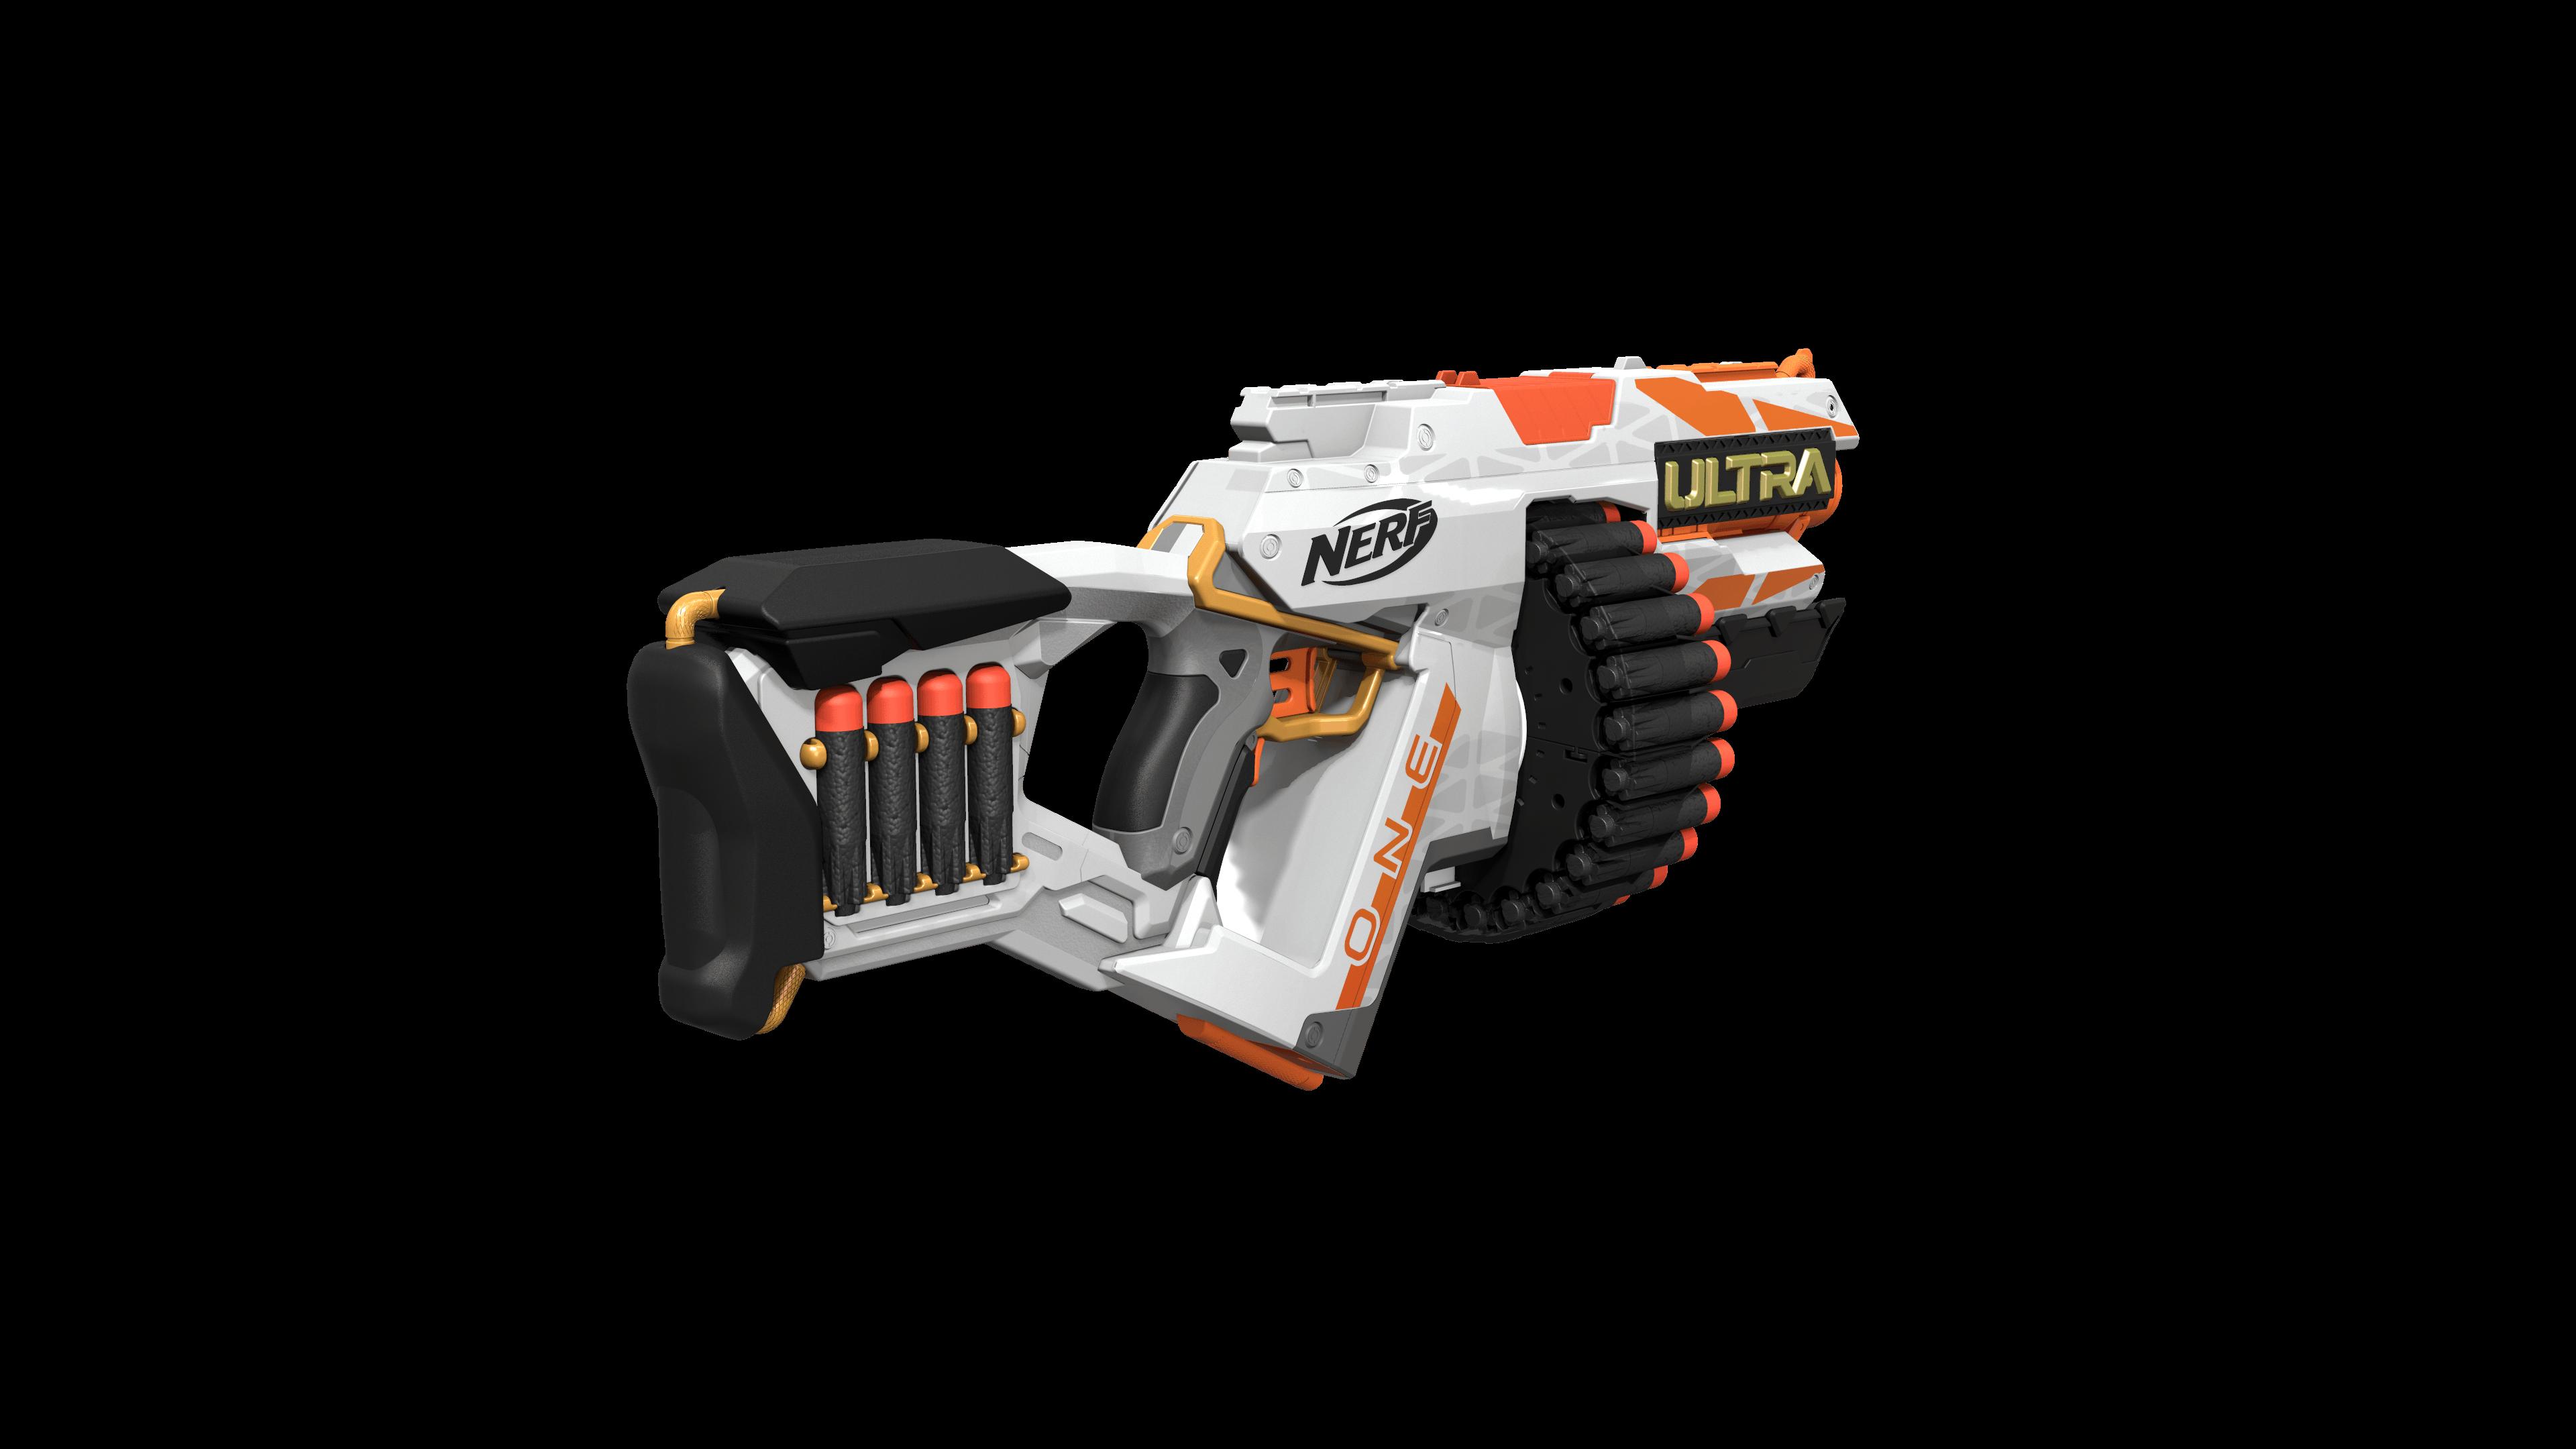 ultra blaster img 18